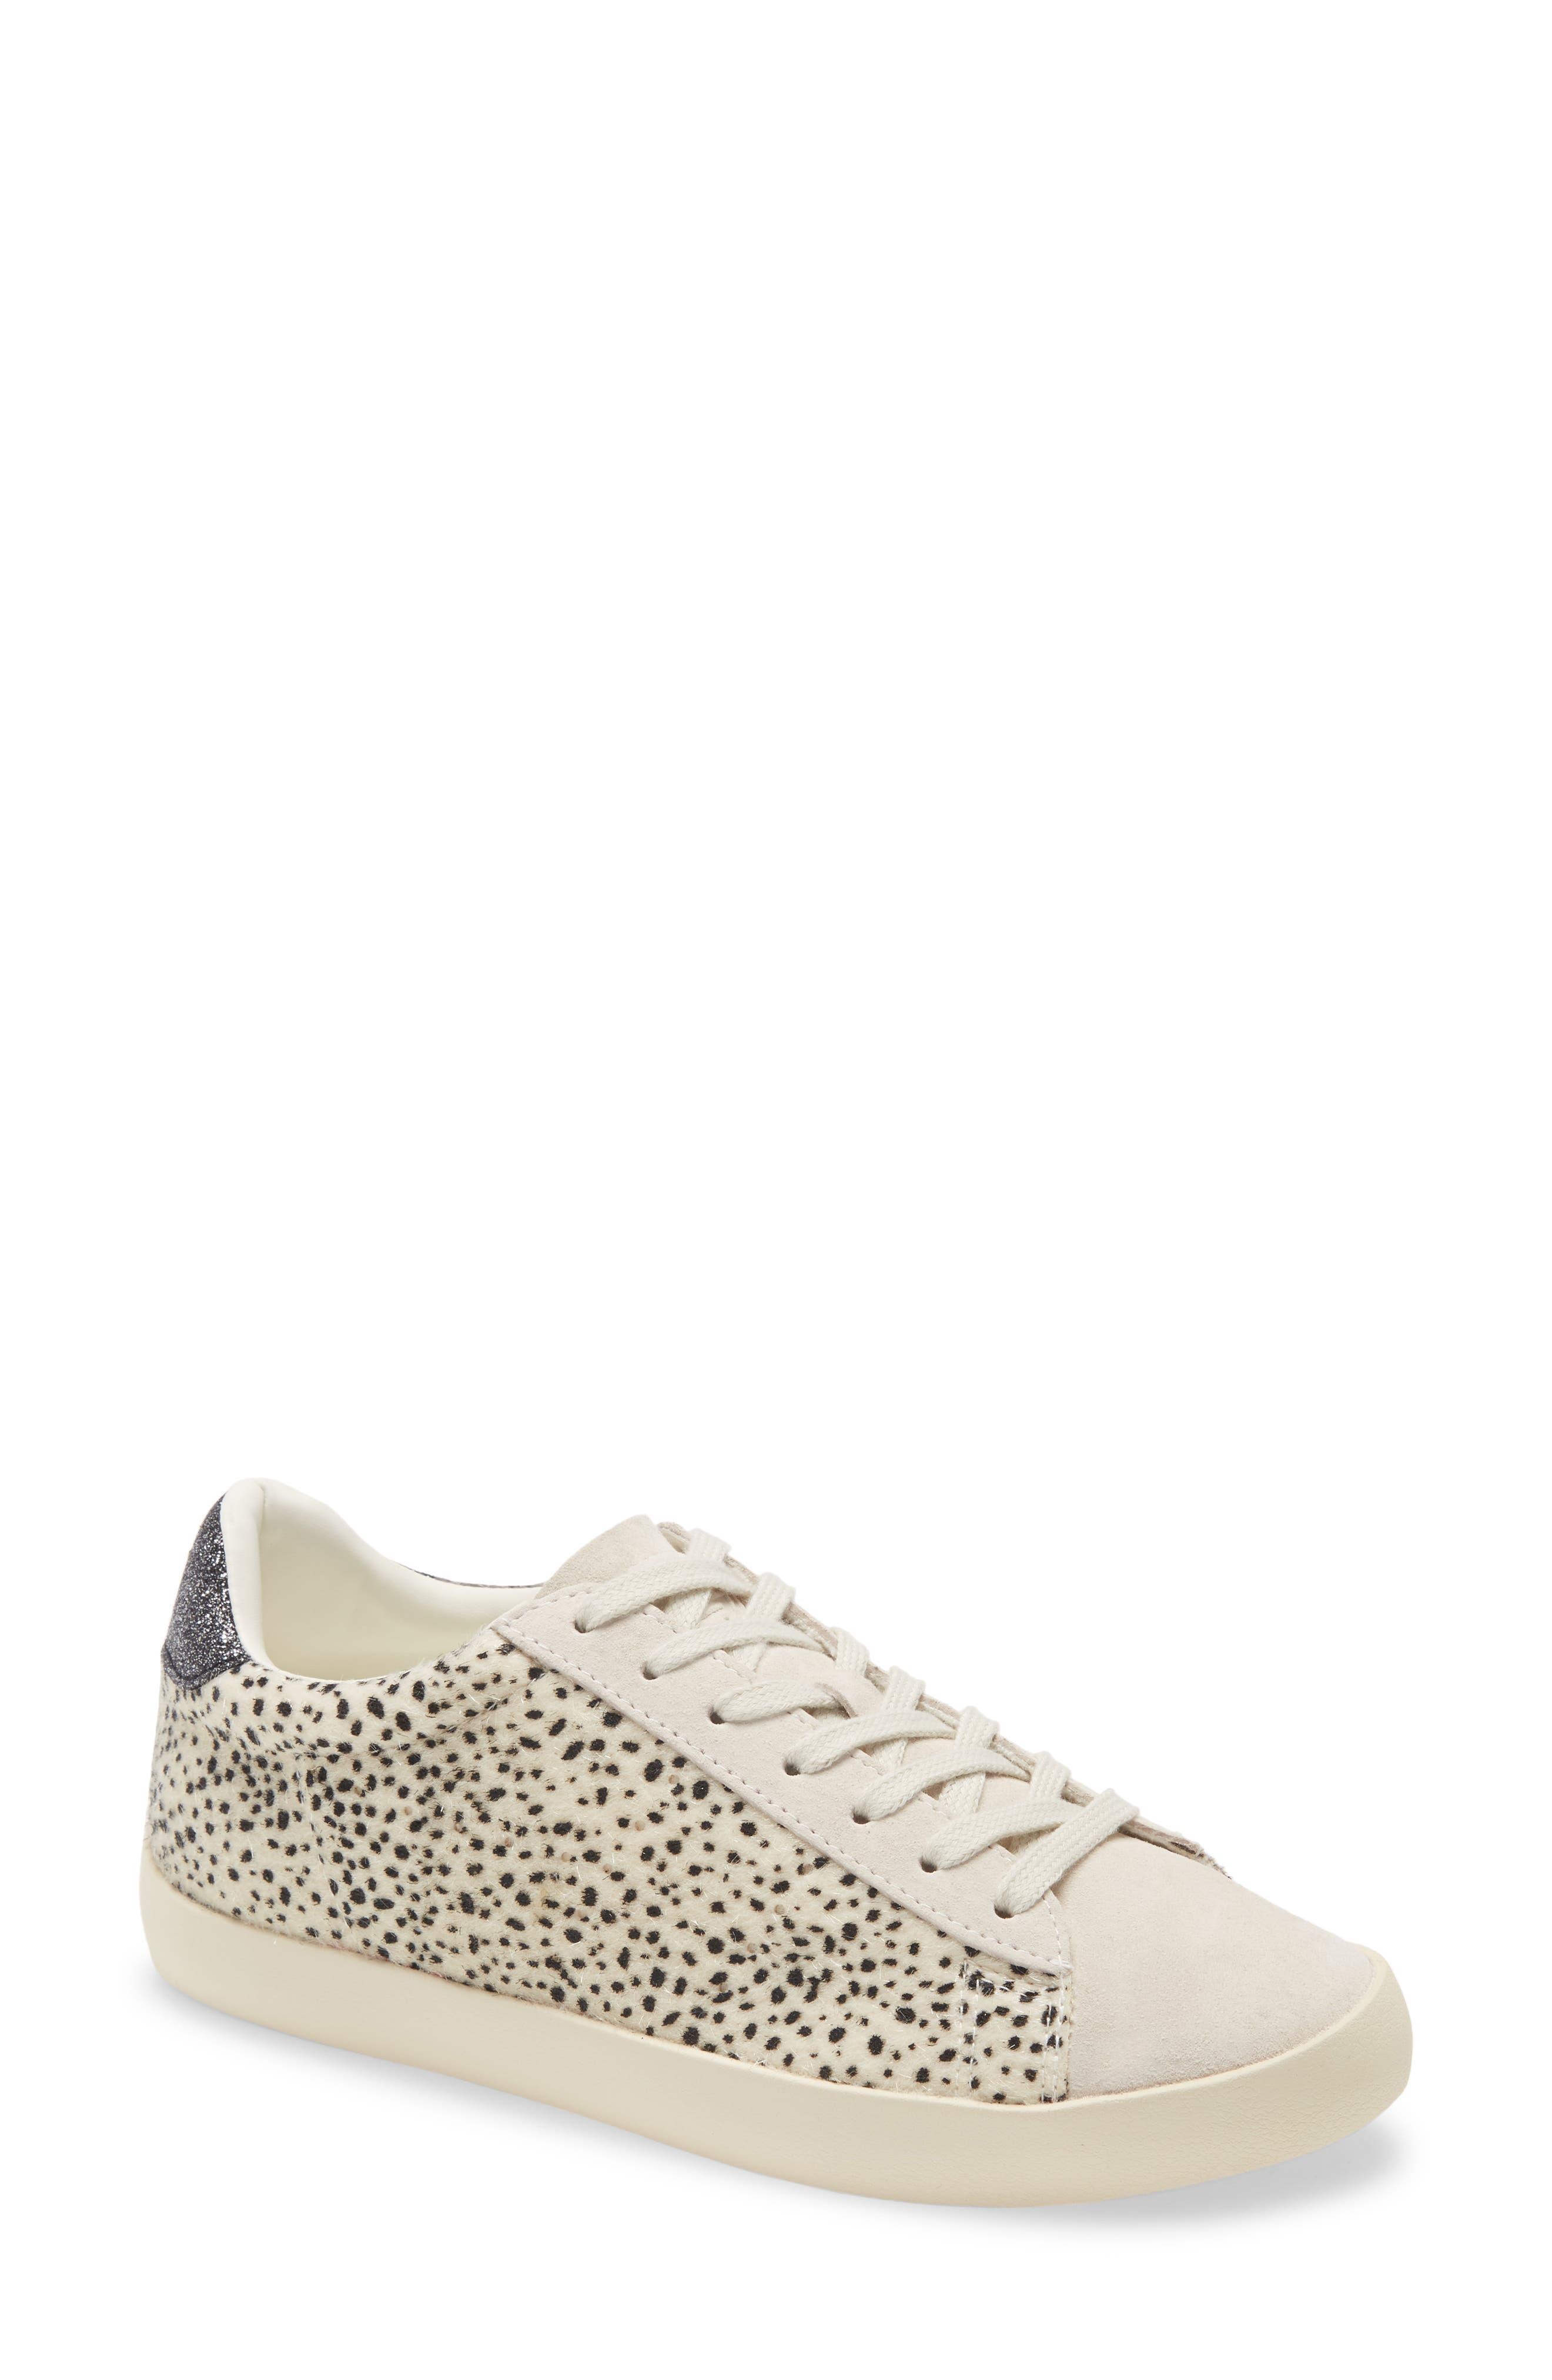 Nova Cheetah Sneaker